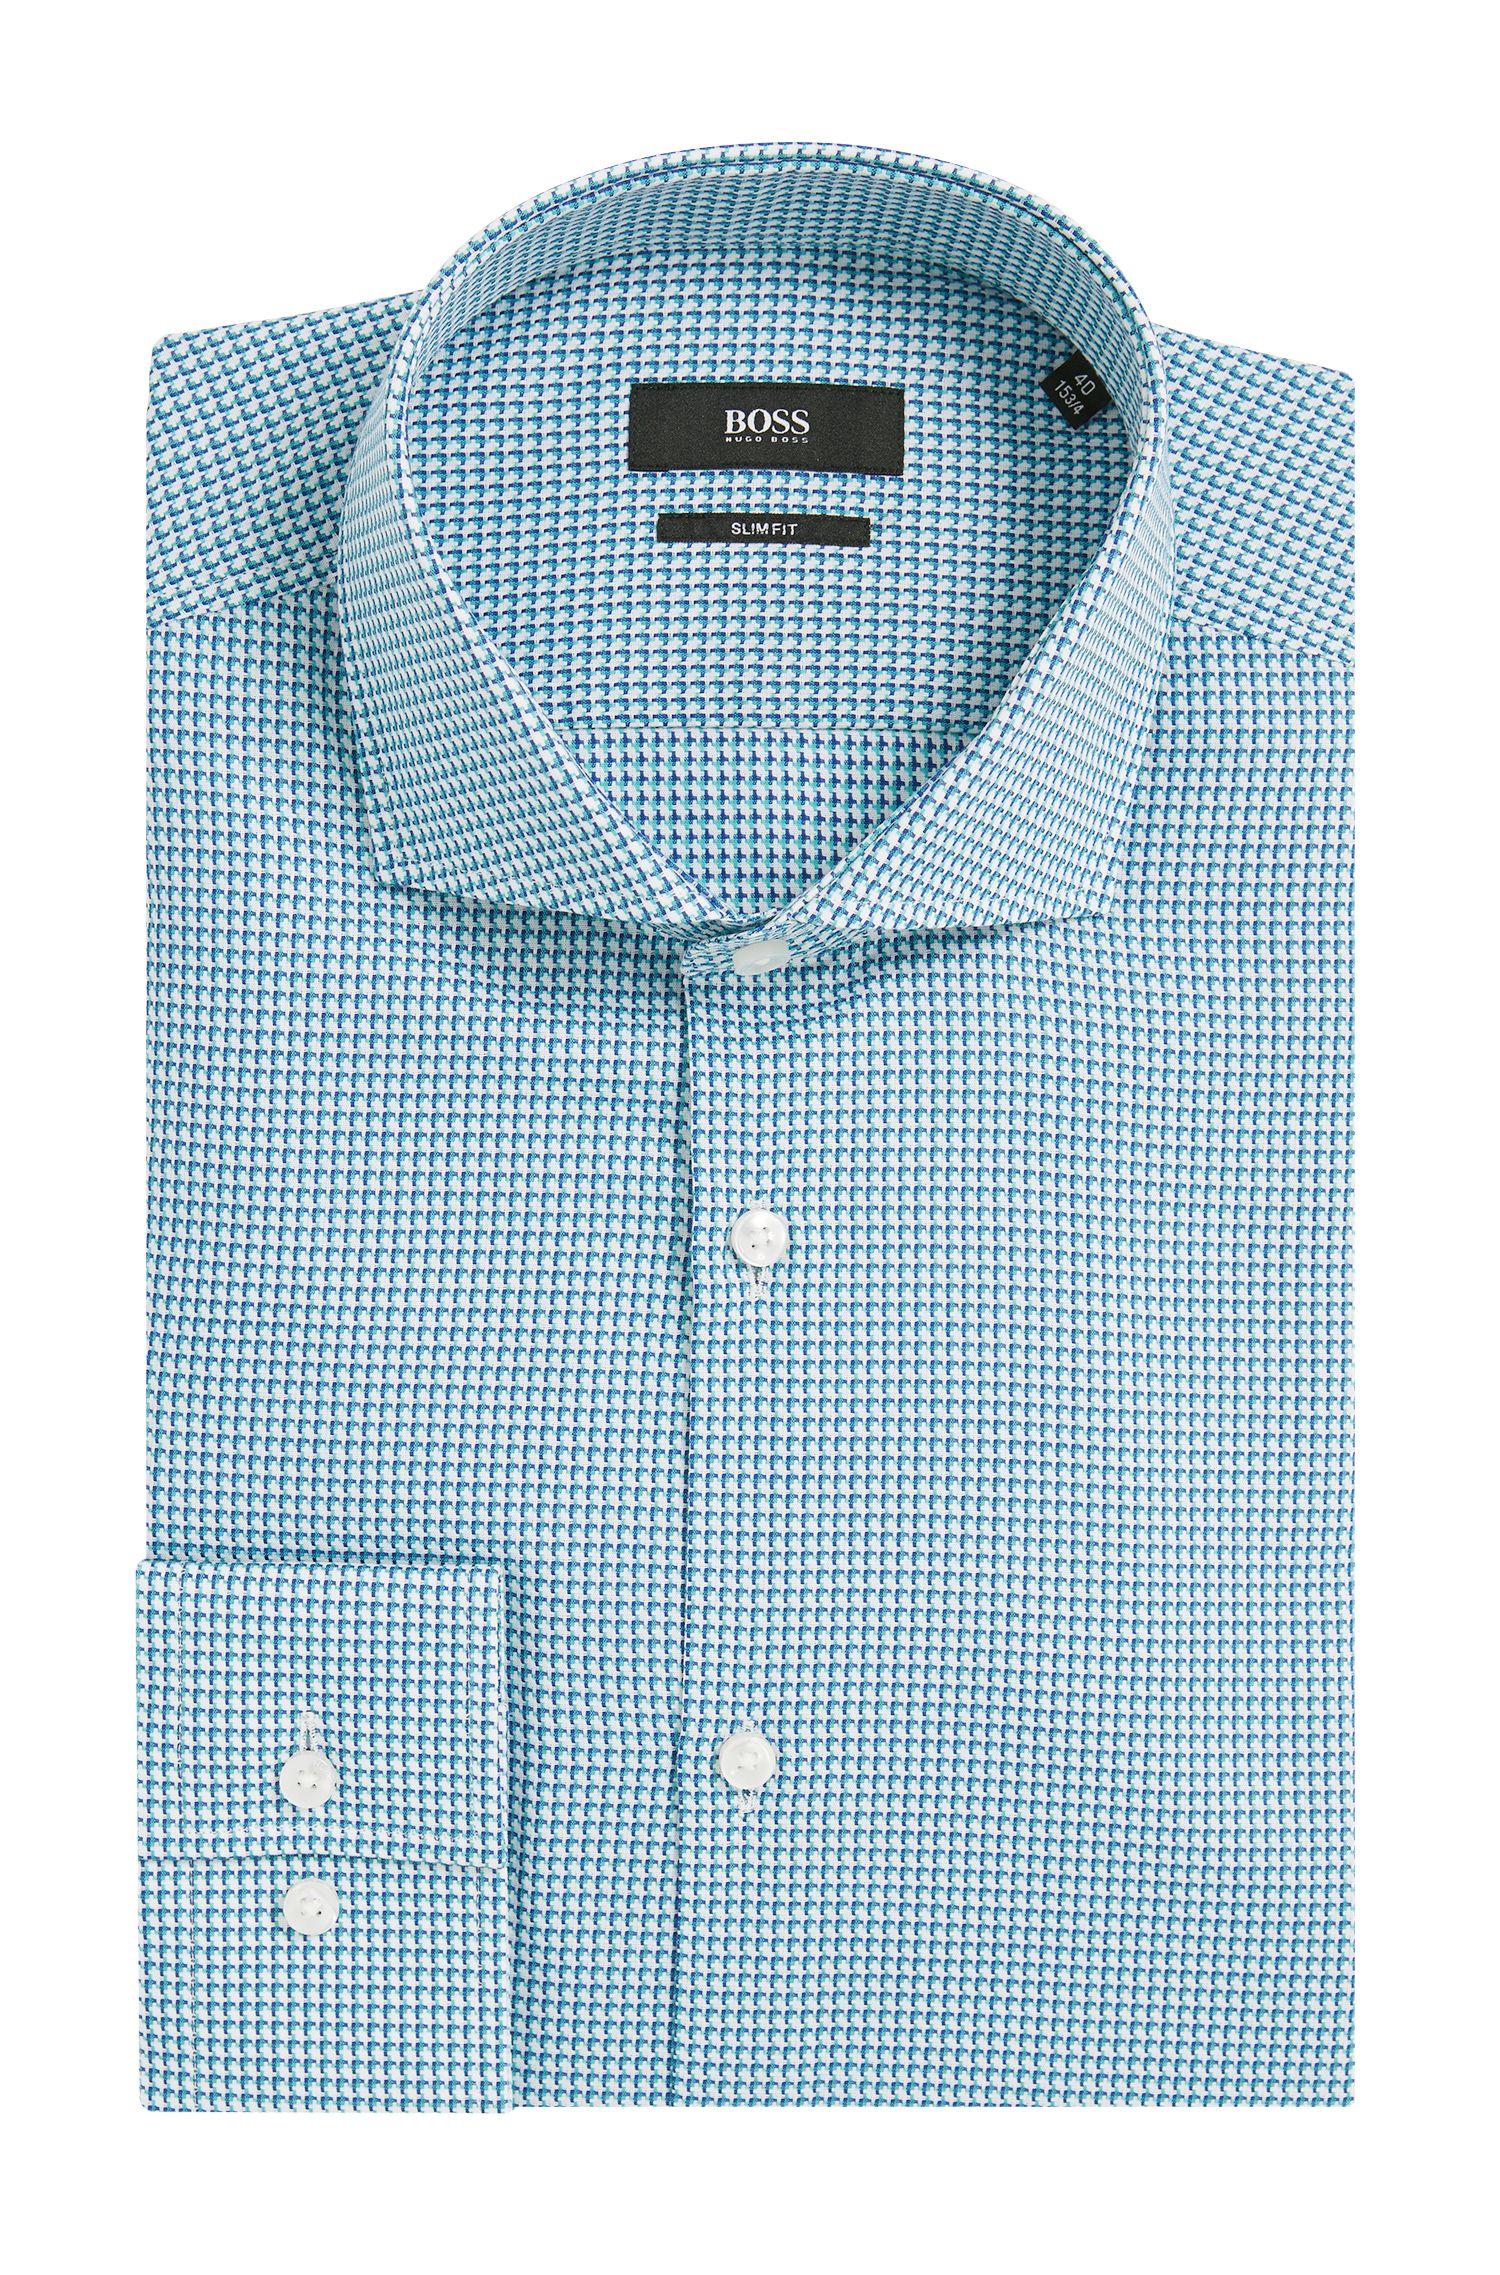 Houndstooth Cotton Dress Shirt, Slim Fit   Jason